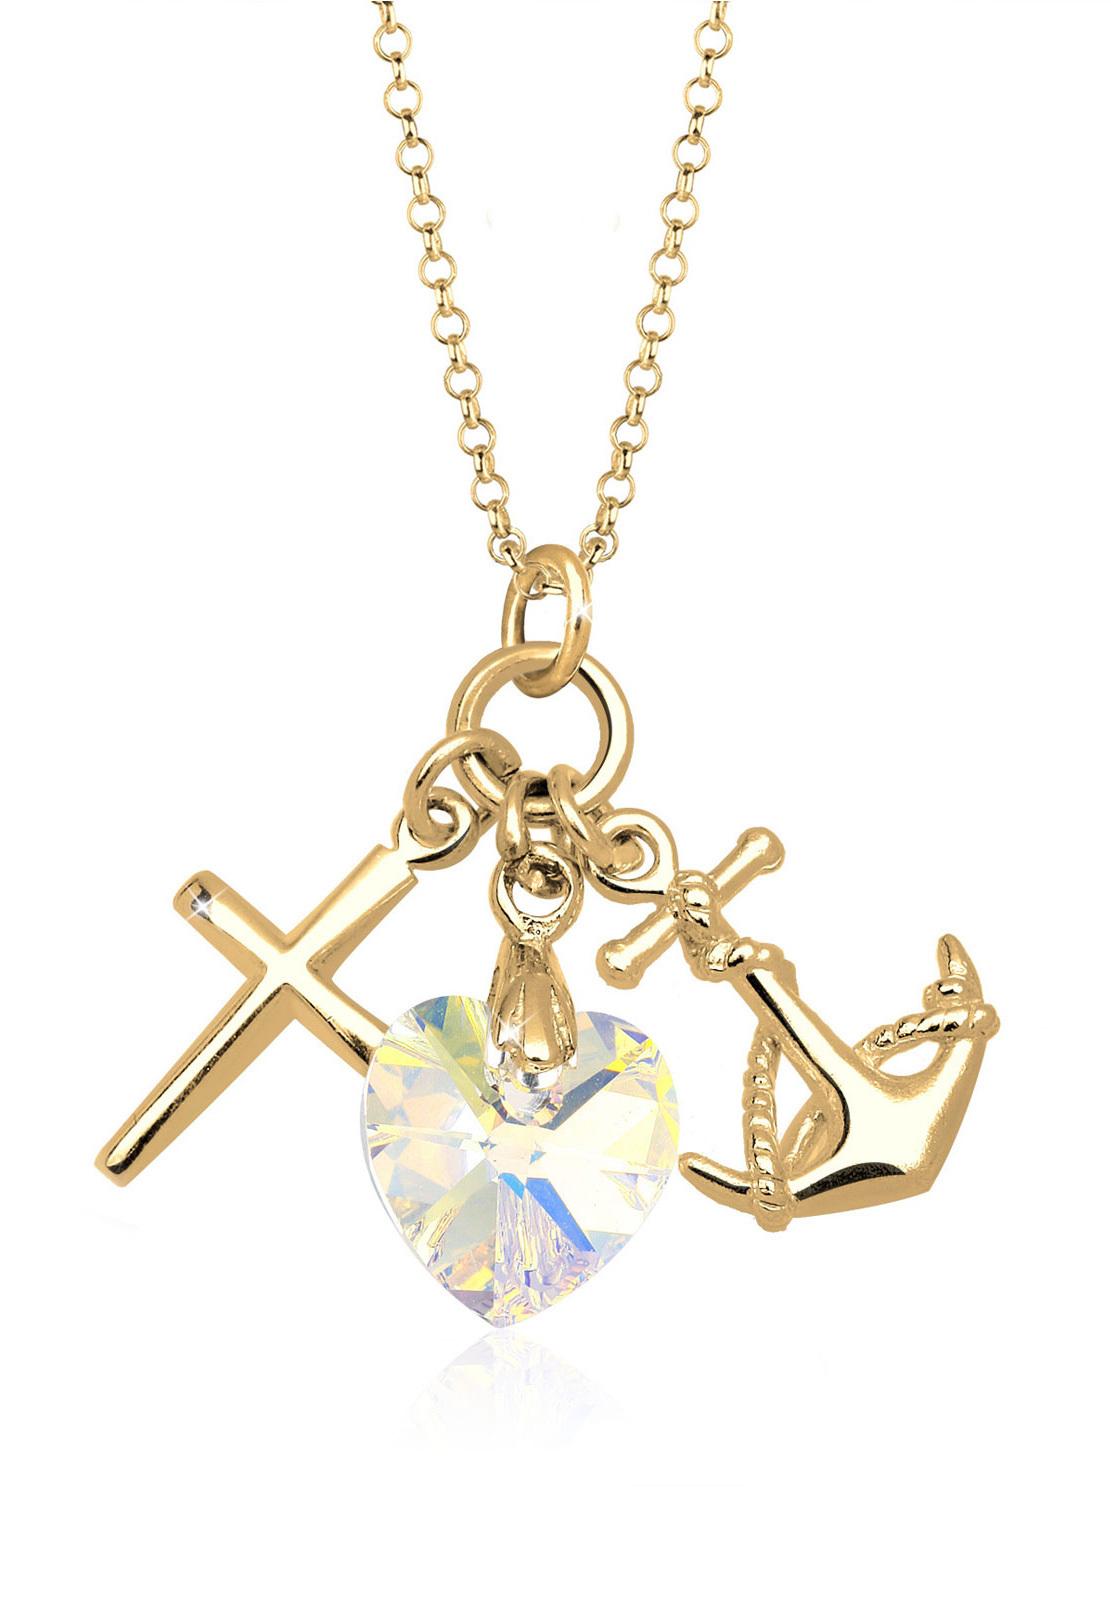 Halskette Anker   Kristall ( Weiß )   925 Sterling Silber vergoldet